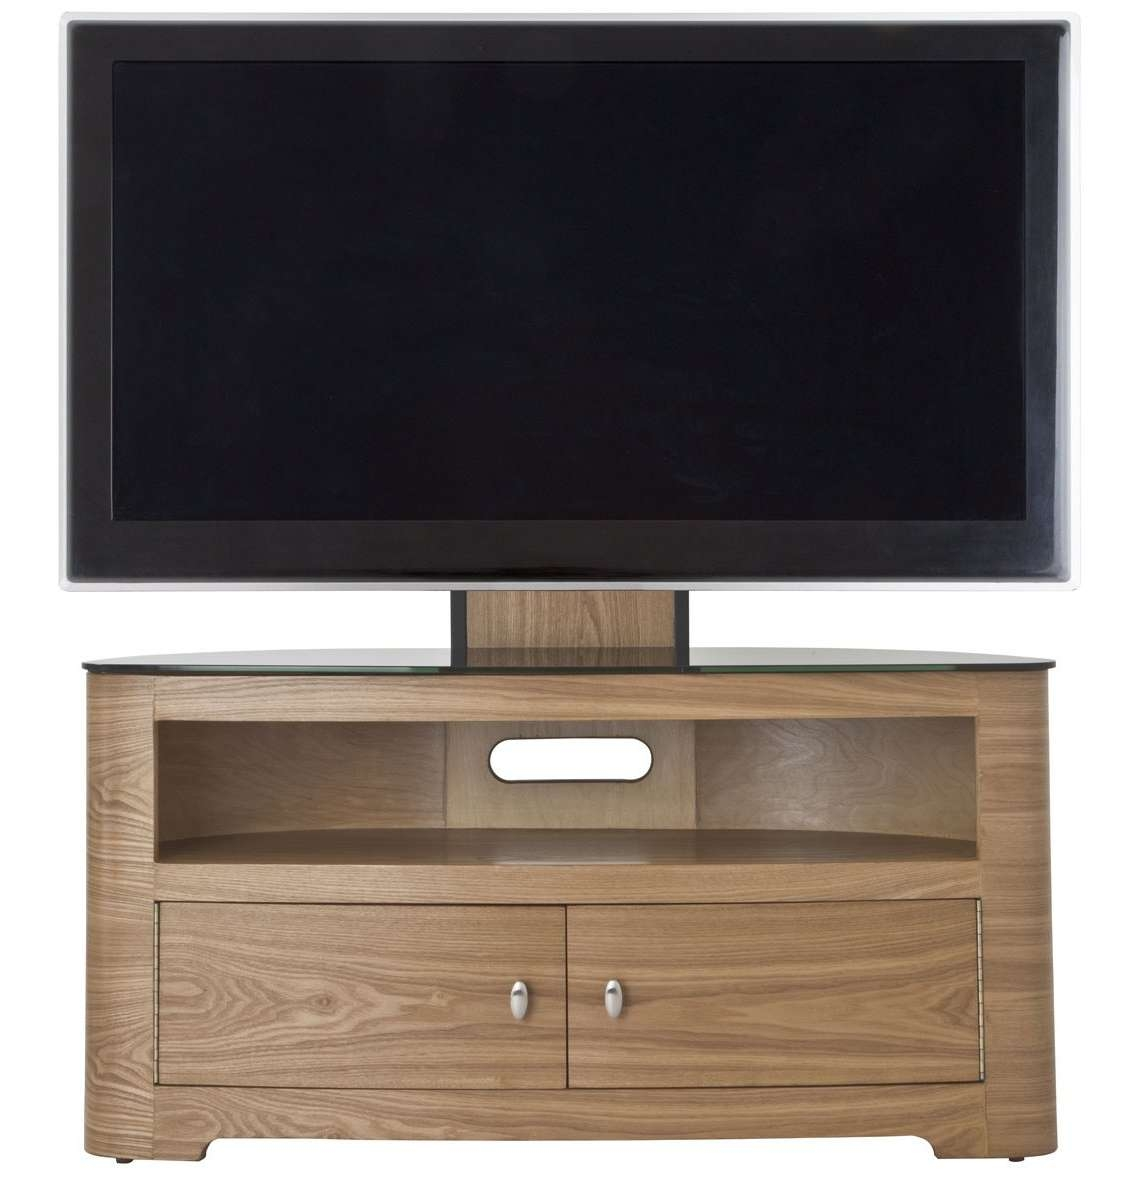 Avf Blenheim Oak Cantilever Tv Stand Regarding Avf Tv Stands (View 1 of 15)